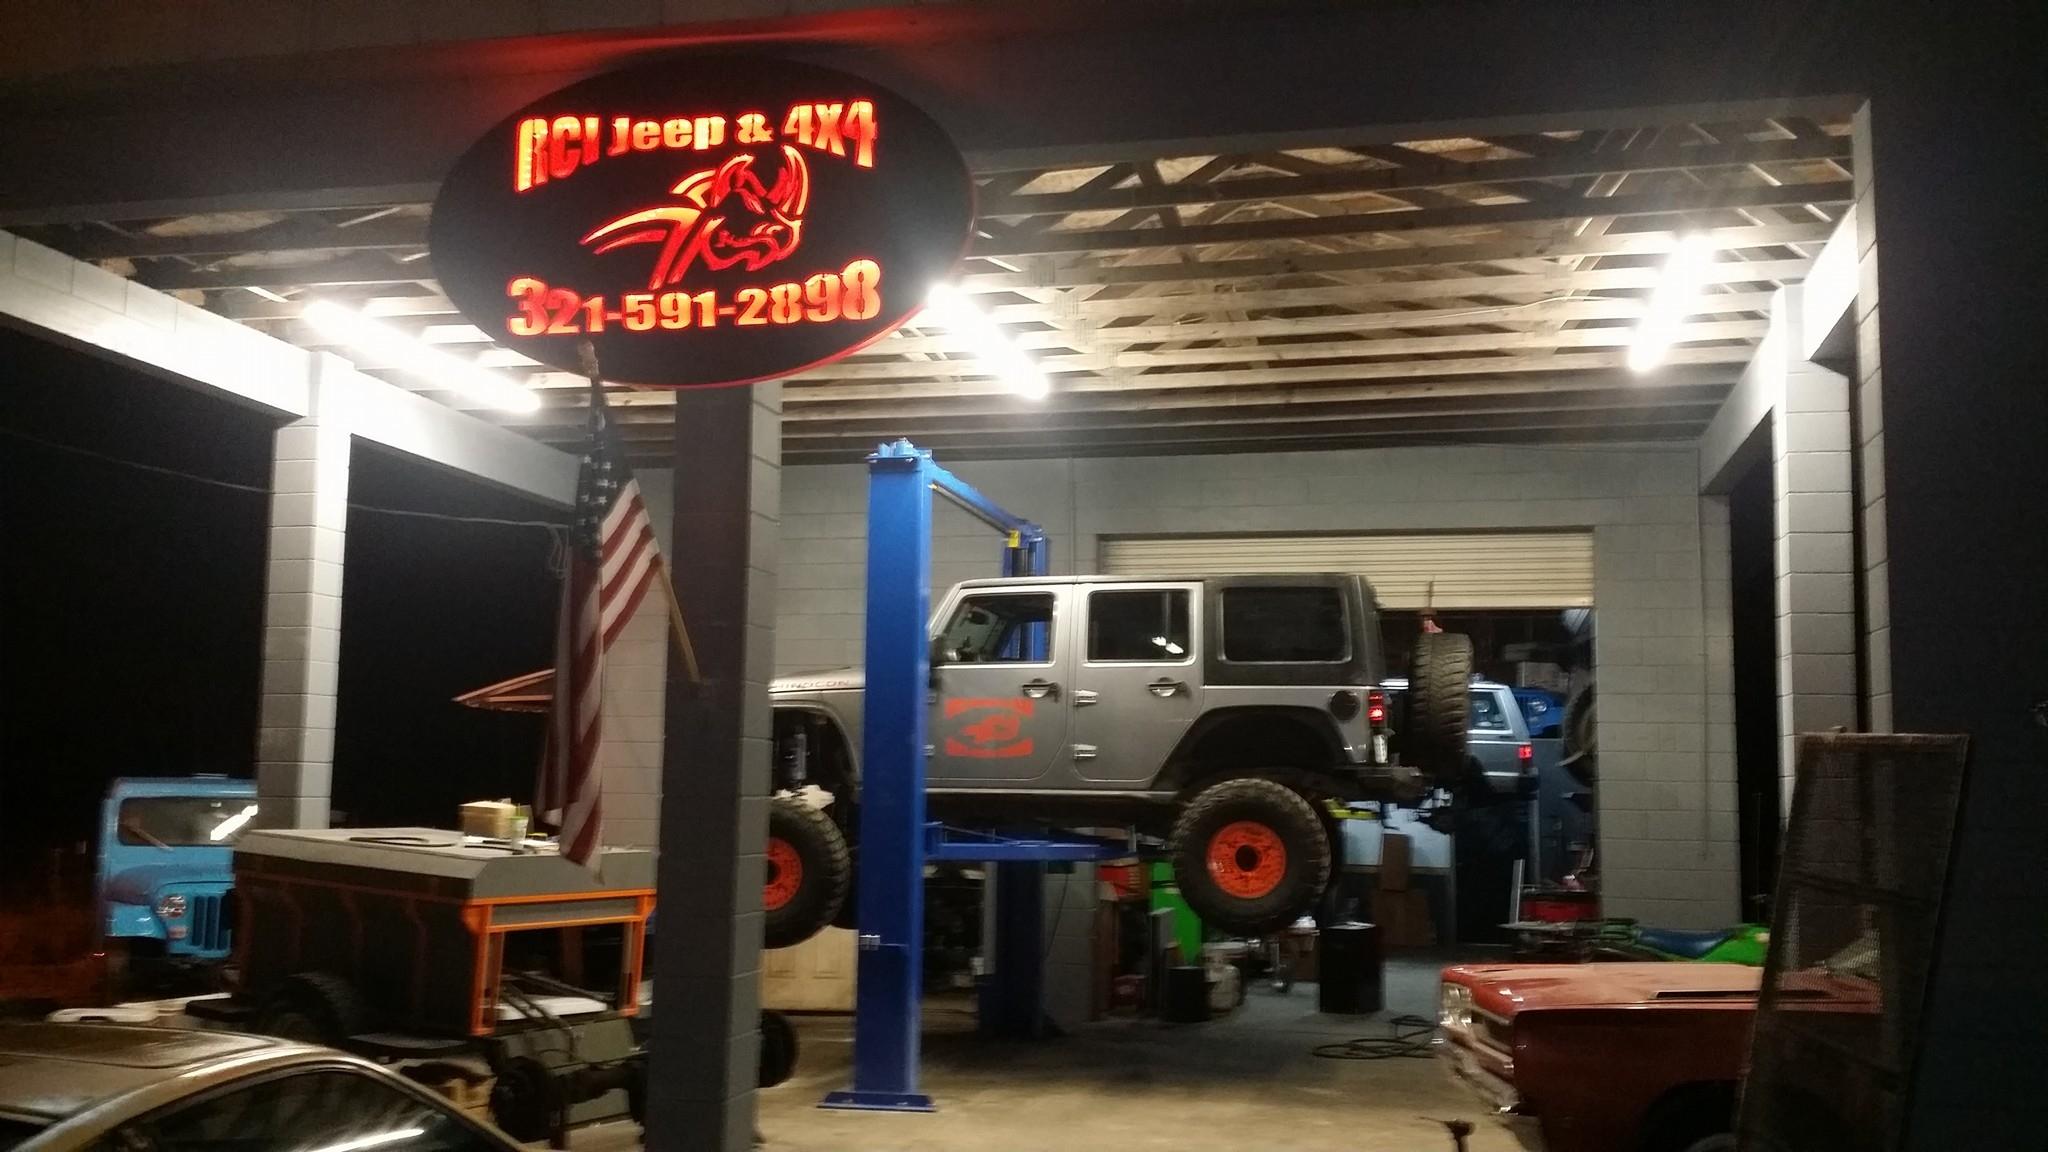 RCI Jeep and 4X4 image 5